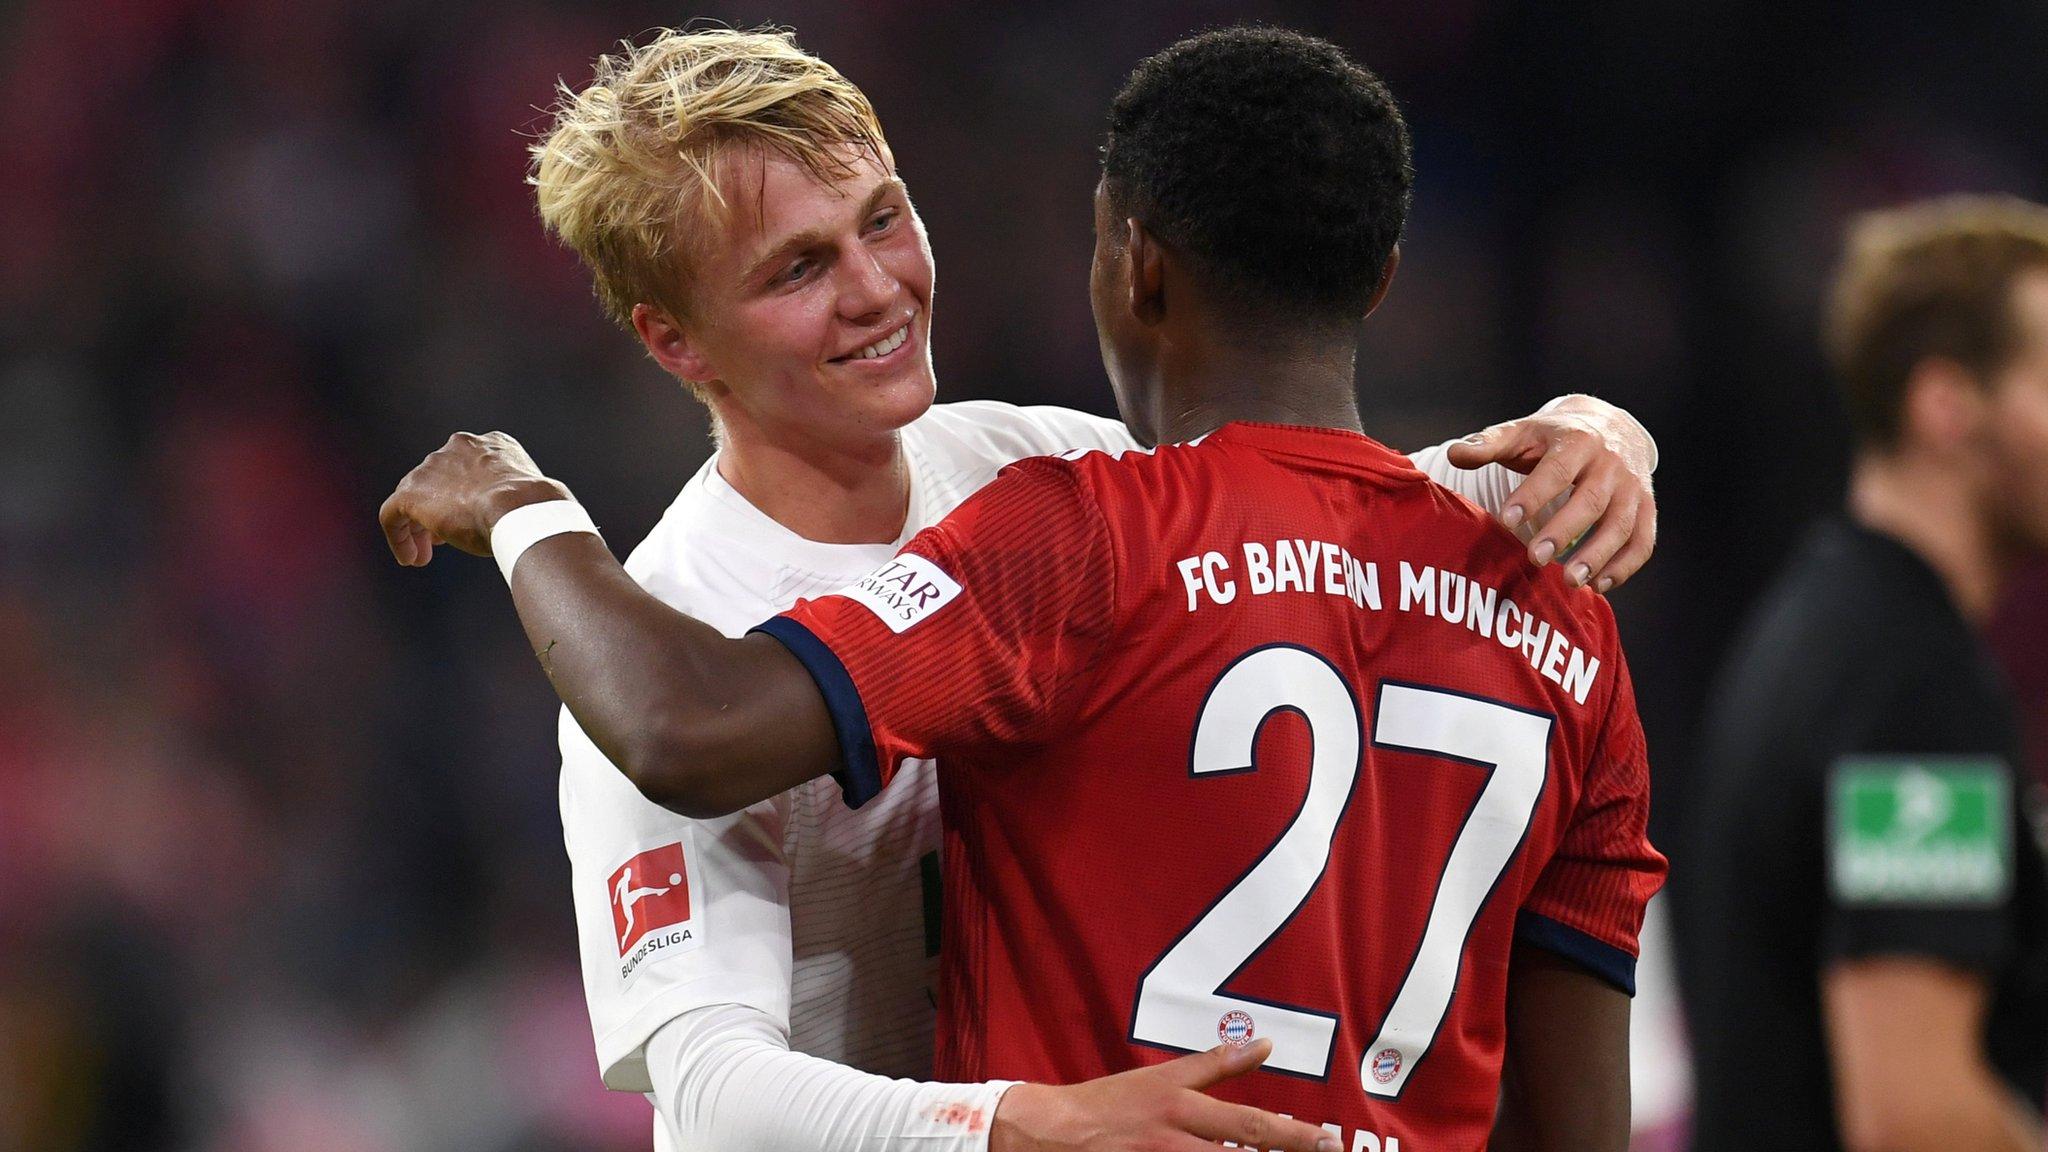 Bayern Munich 1-1 Augsburg: Late Felix Gotze goal denies champions